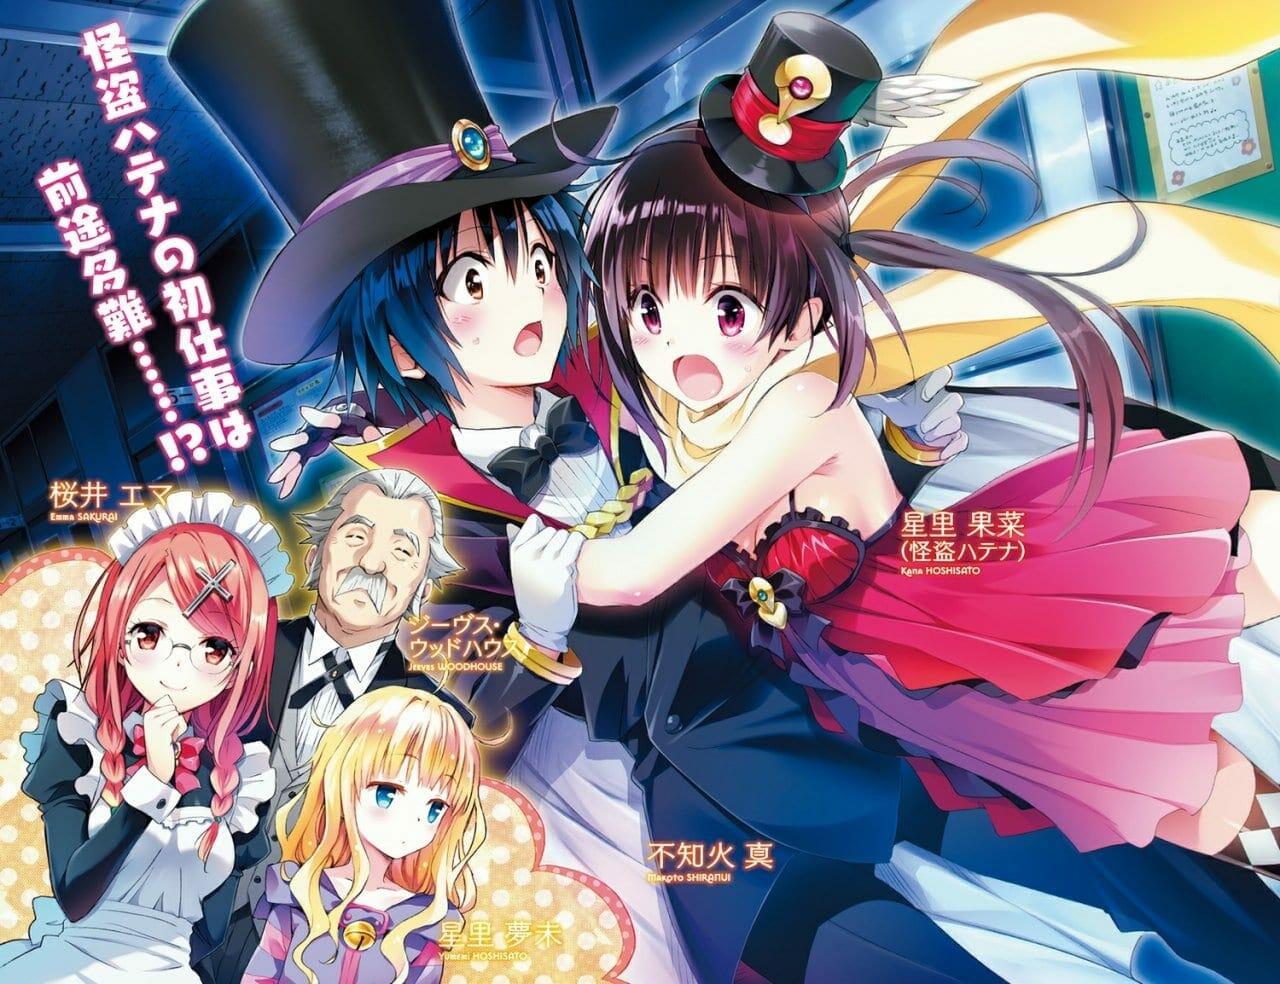 Hatena☆Illusion anime